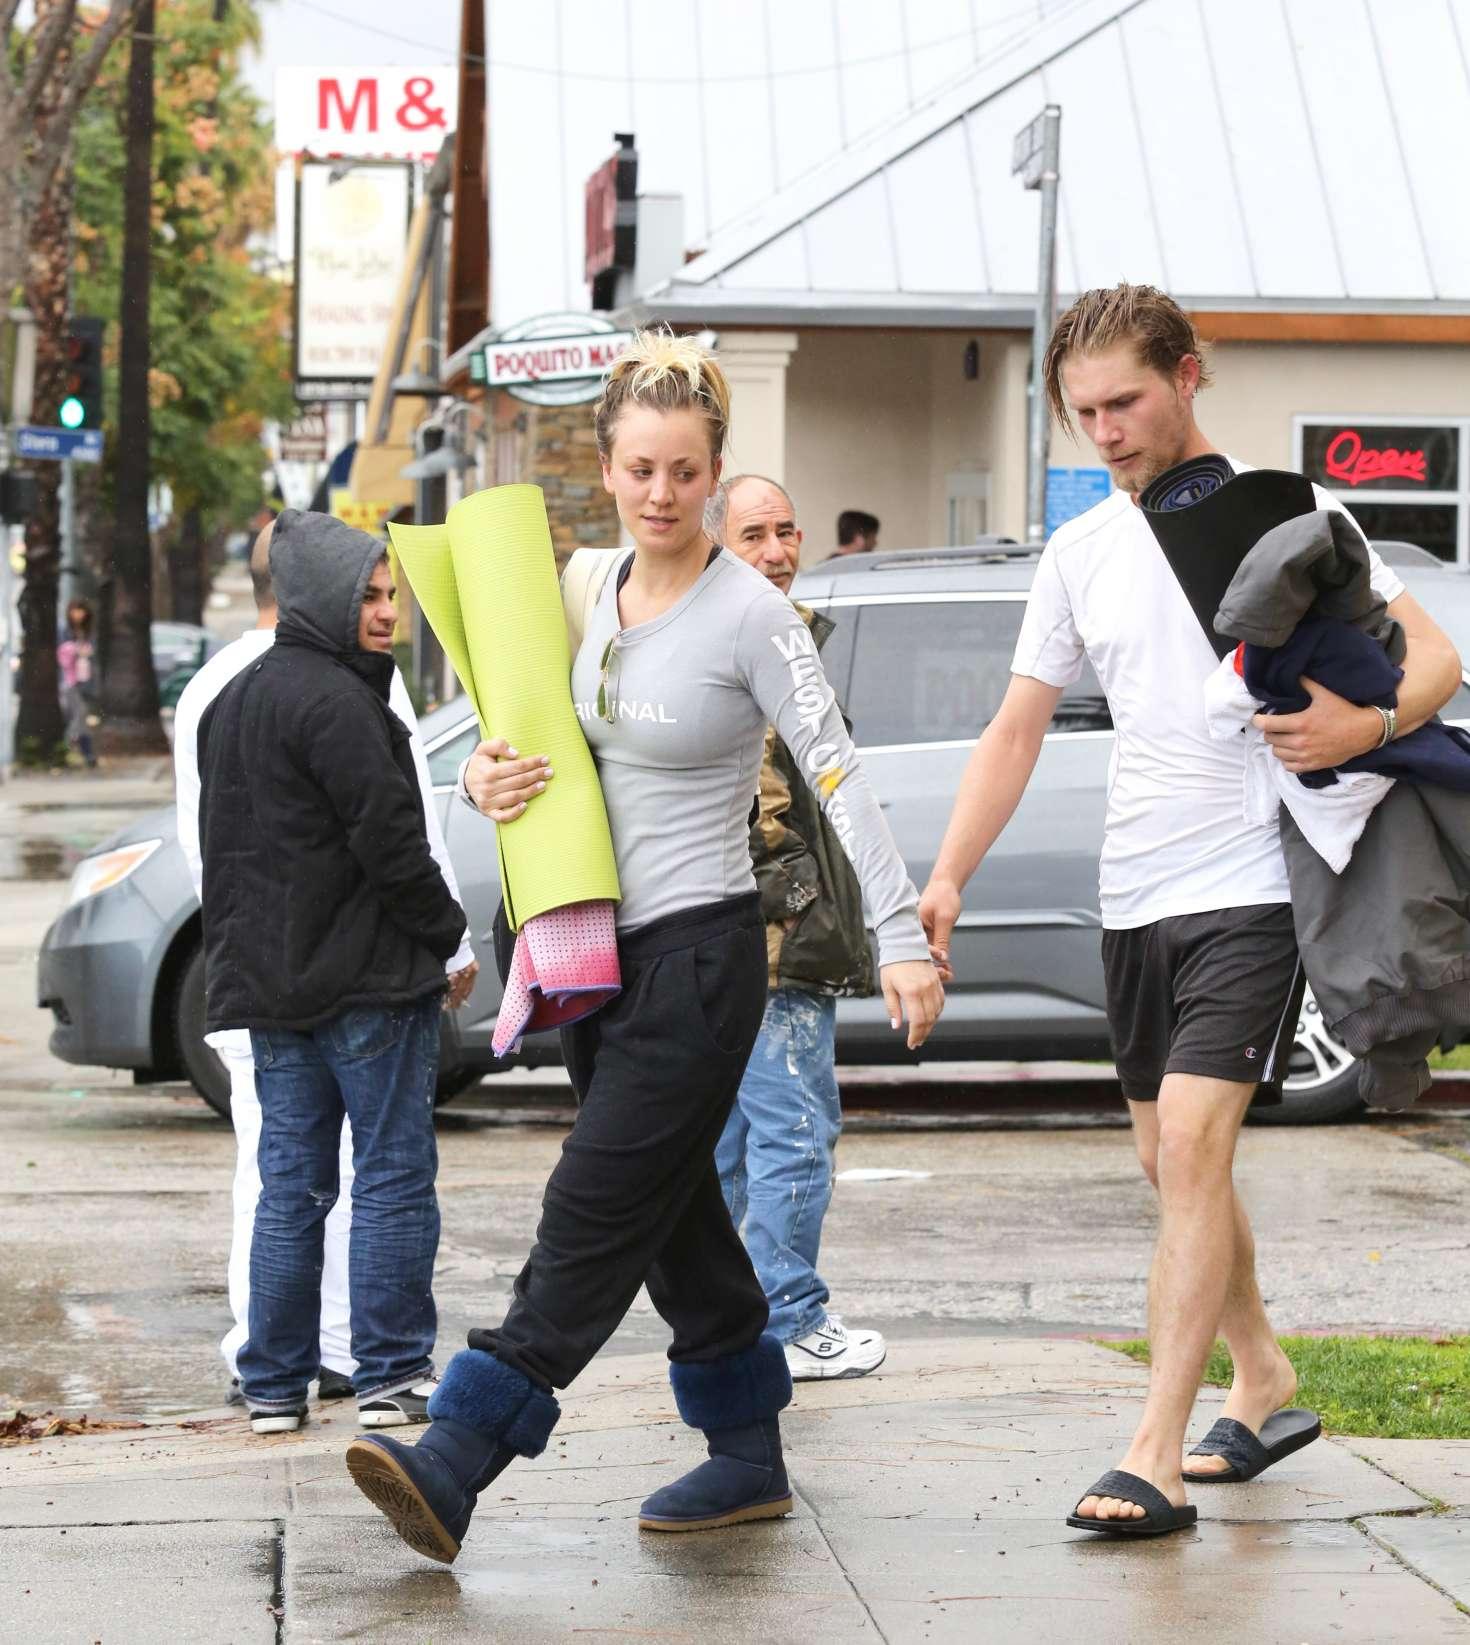 Kaley Cuoco 2017 : Kaley Cuoco and boyfriend Karl Cook Leaves yoga class -13